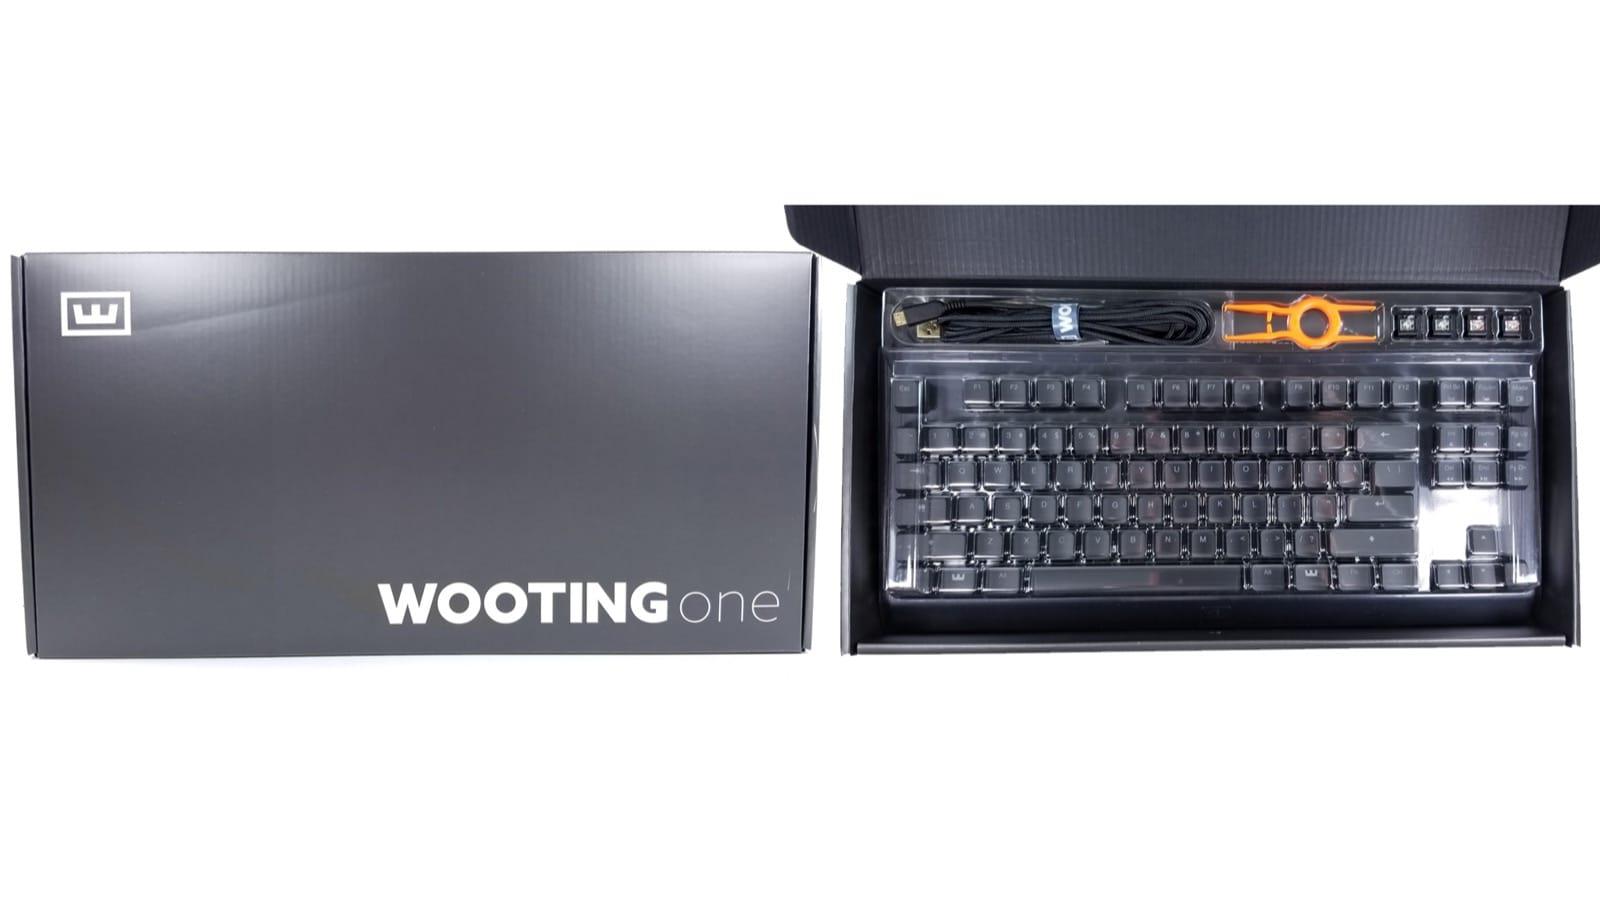 wooting-one-analog-keyboard-review-1-0.jpg